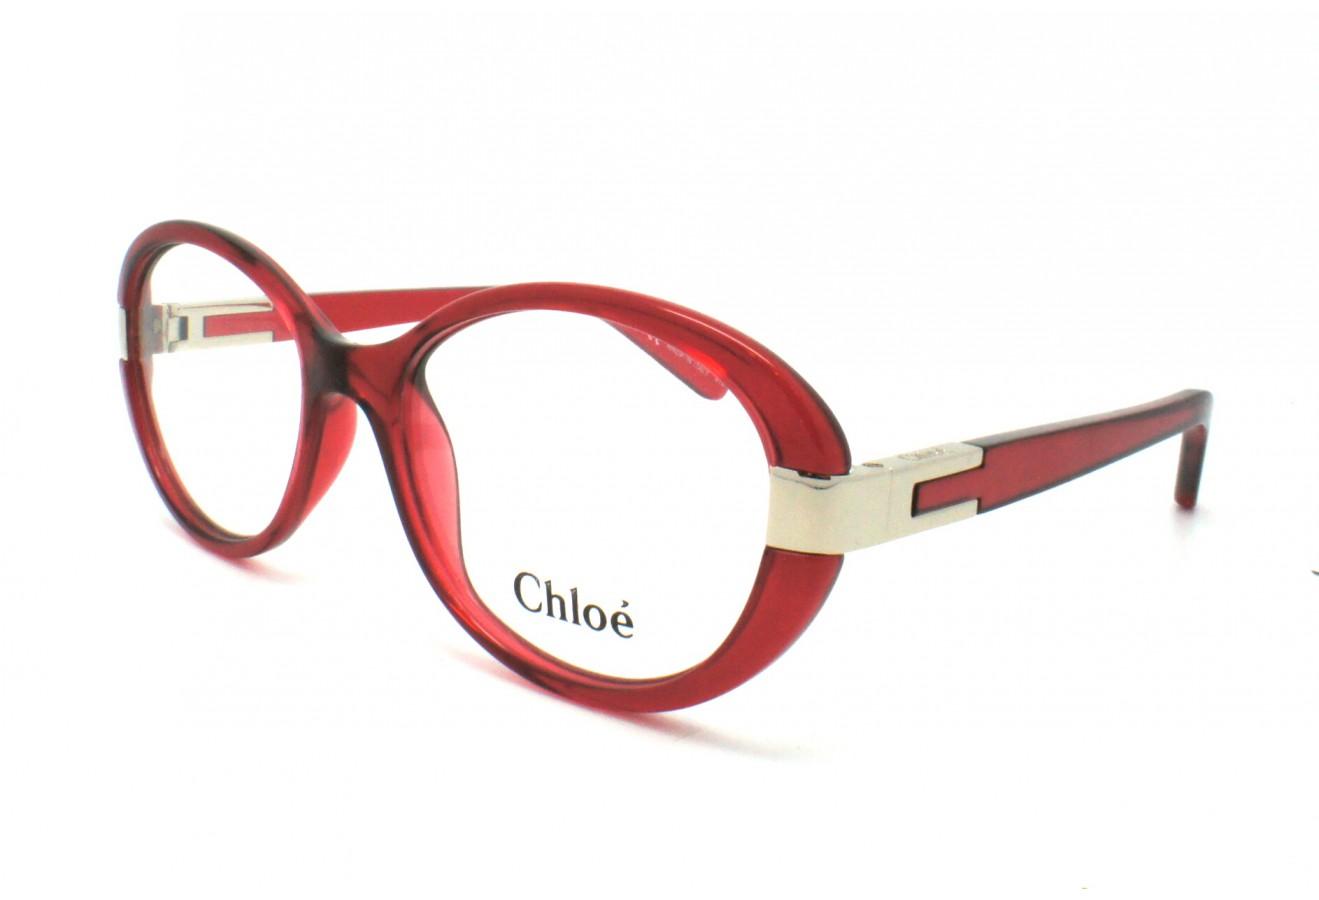 lunettes de vue chloe ce 2656 613 52 17. Black Bedroom Furniture Sets. Home Design Ideas